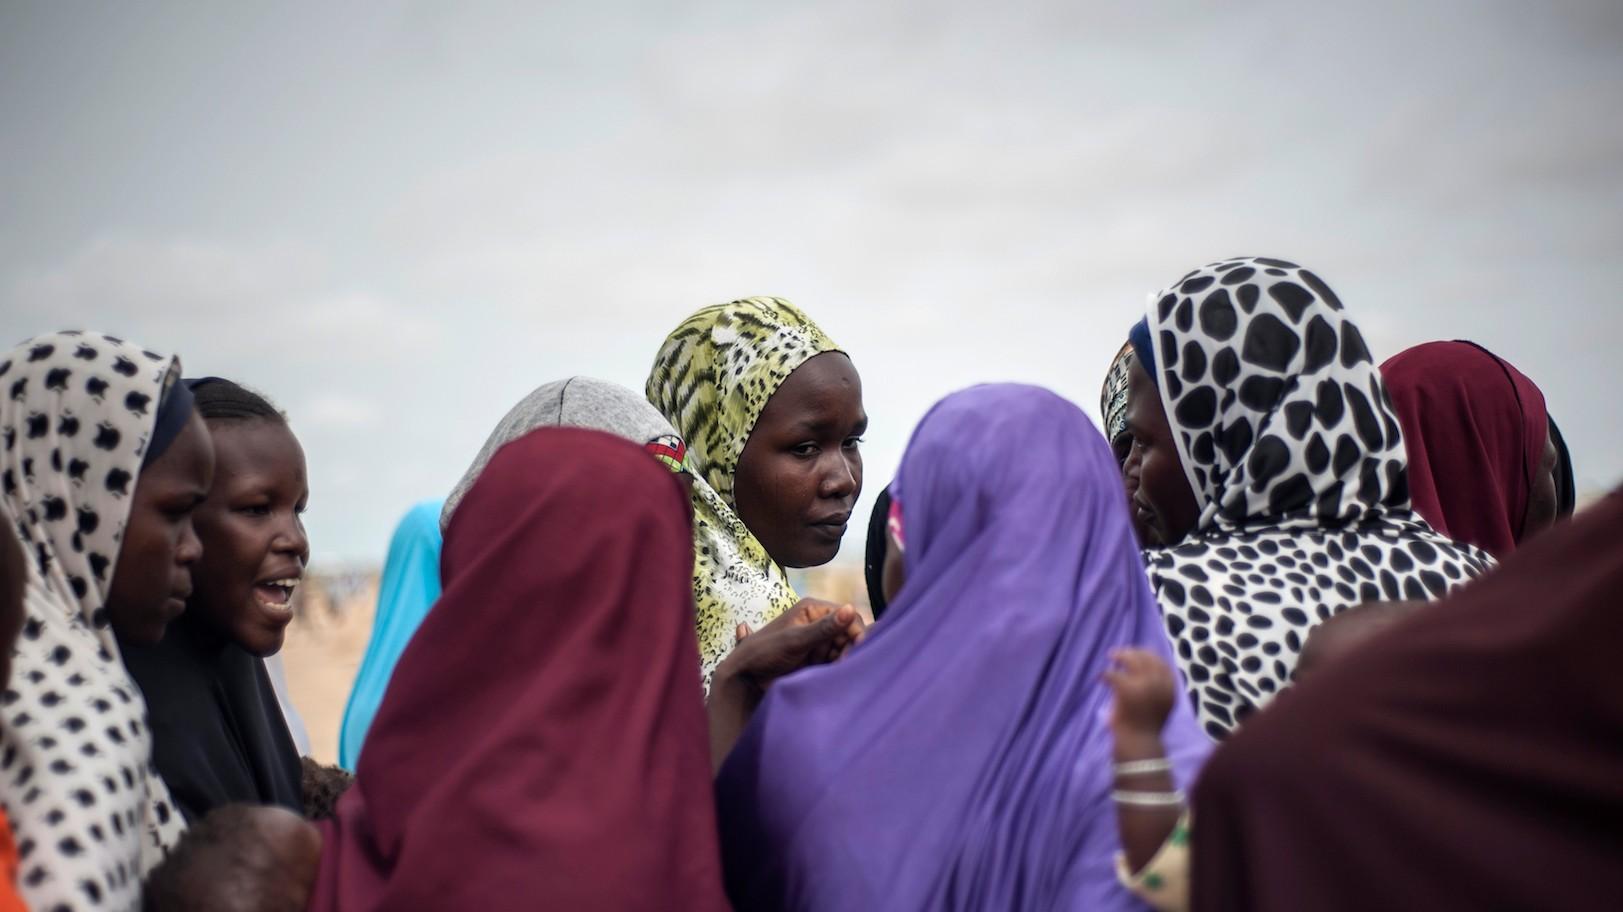 How Boko Haram militants rape, abuse girls, women - Report